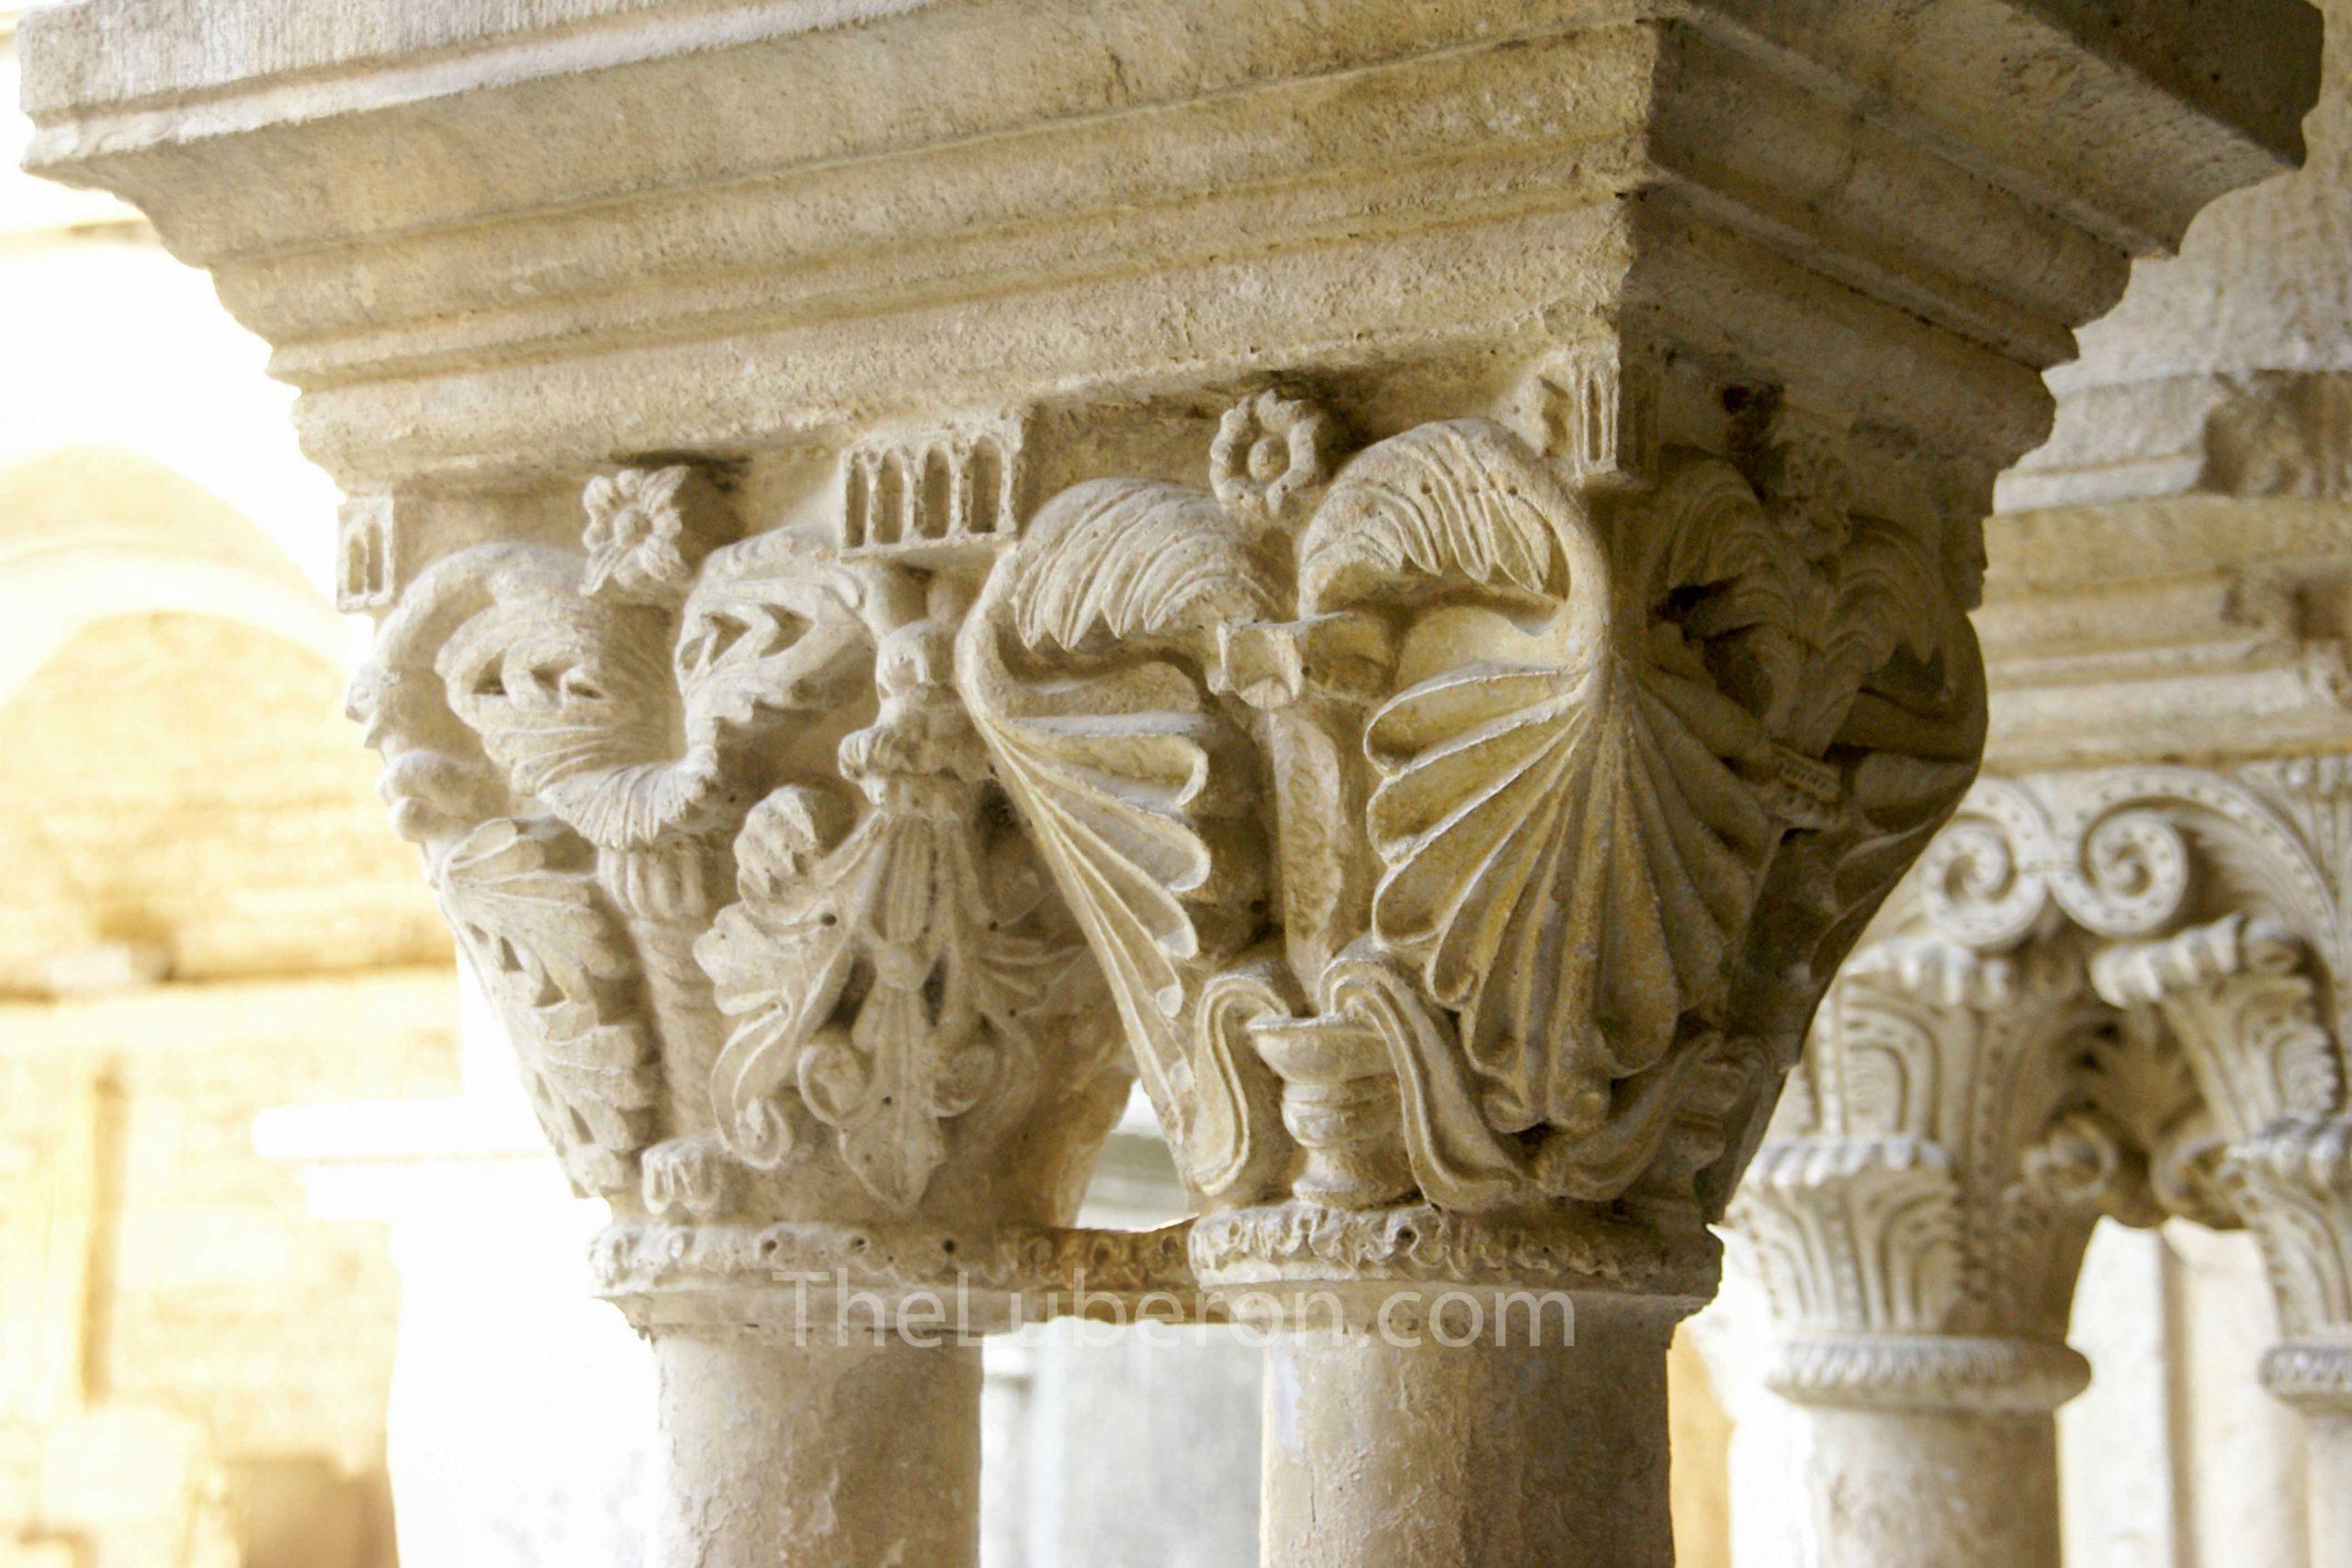 Roman columns at Vaison-la-Romaine